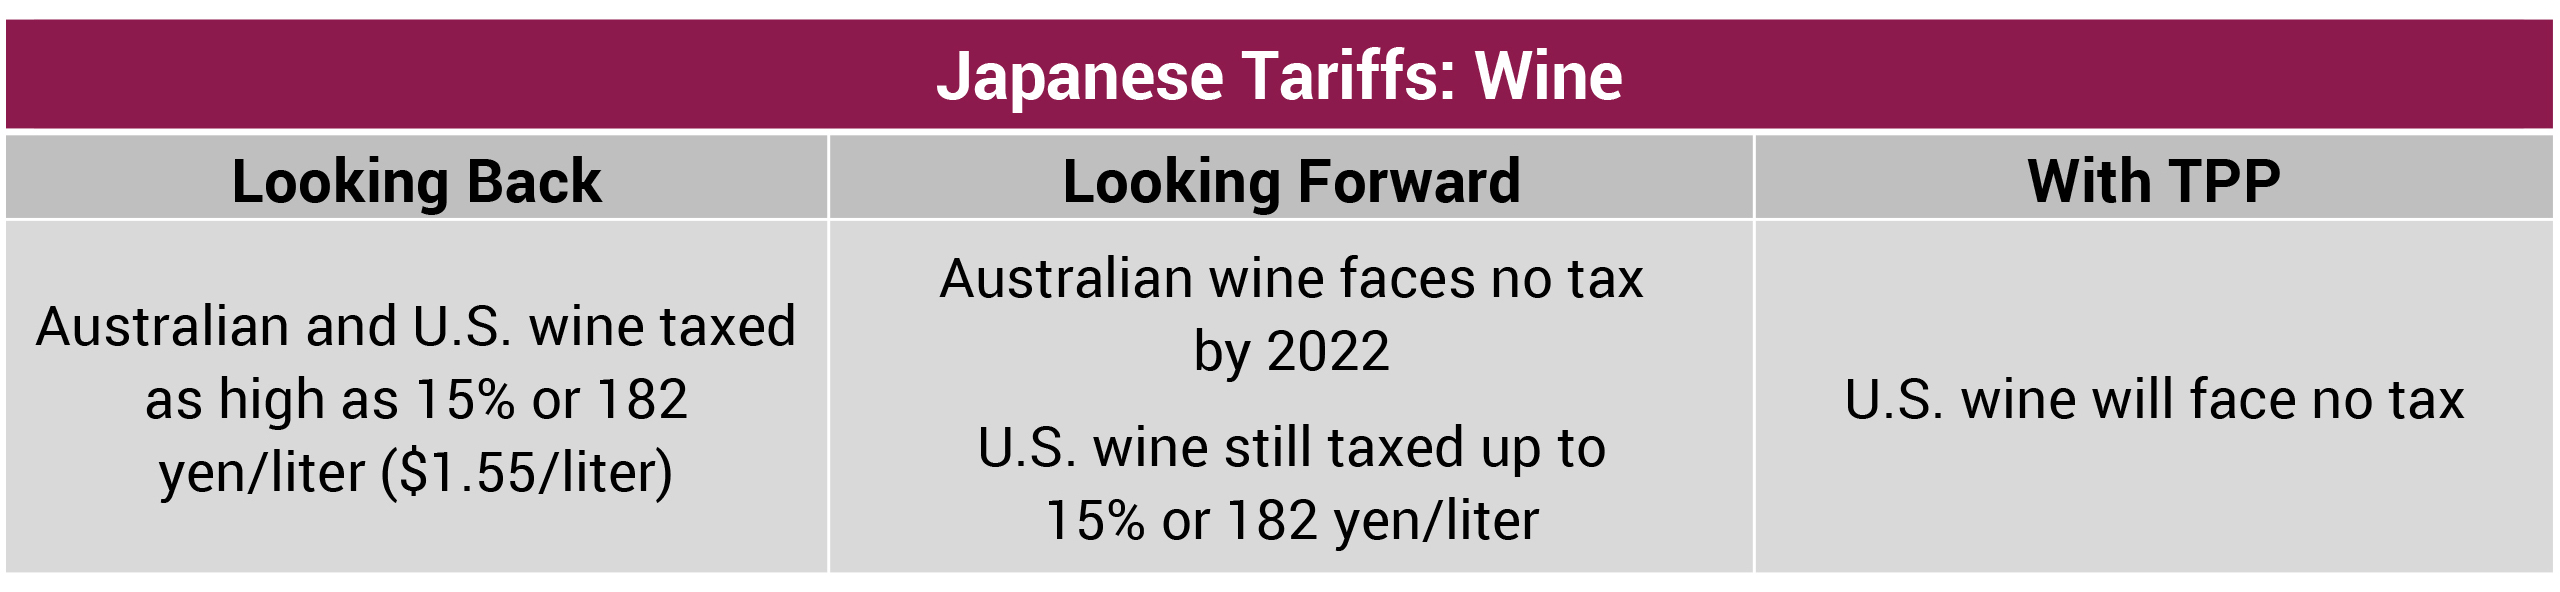 Japanese Tariffs Wine